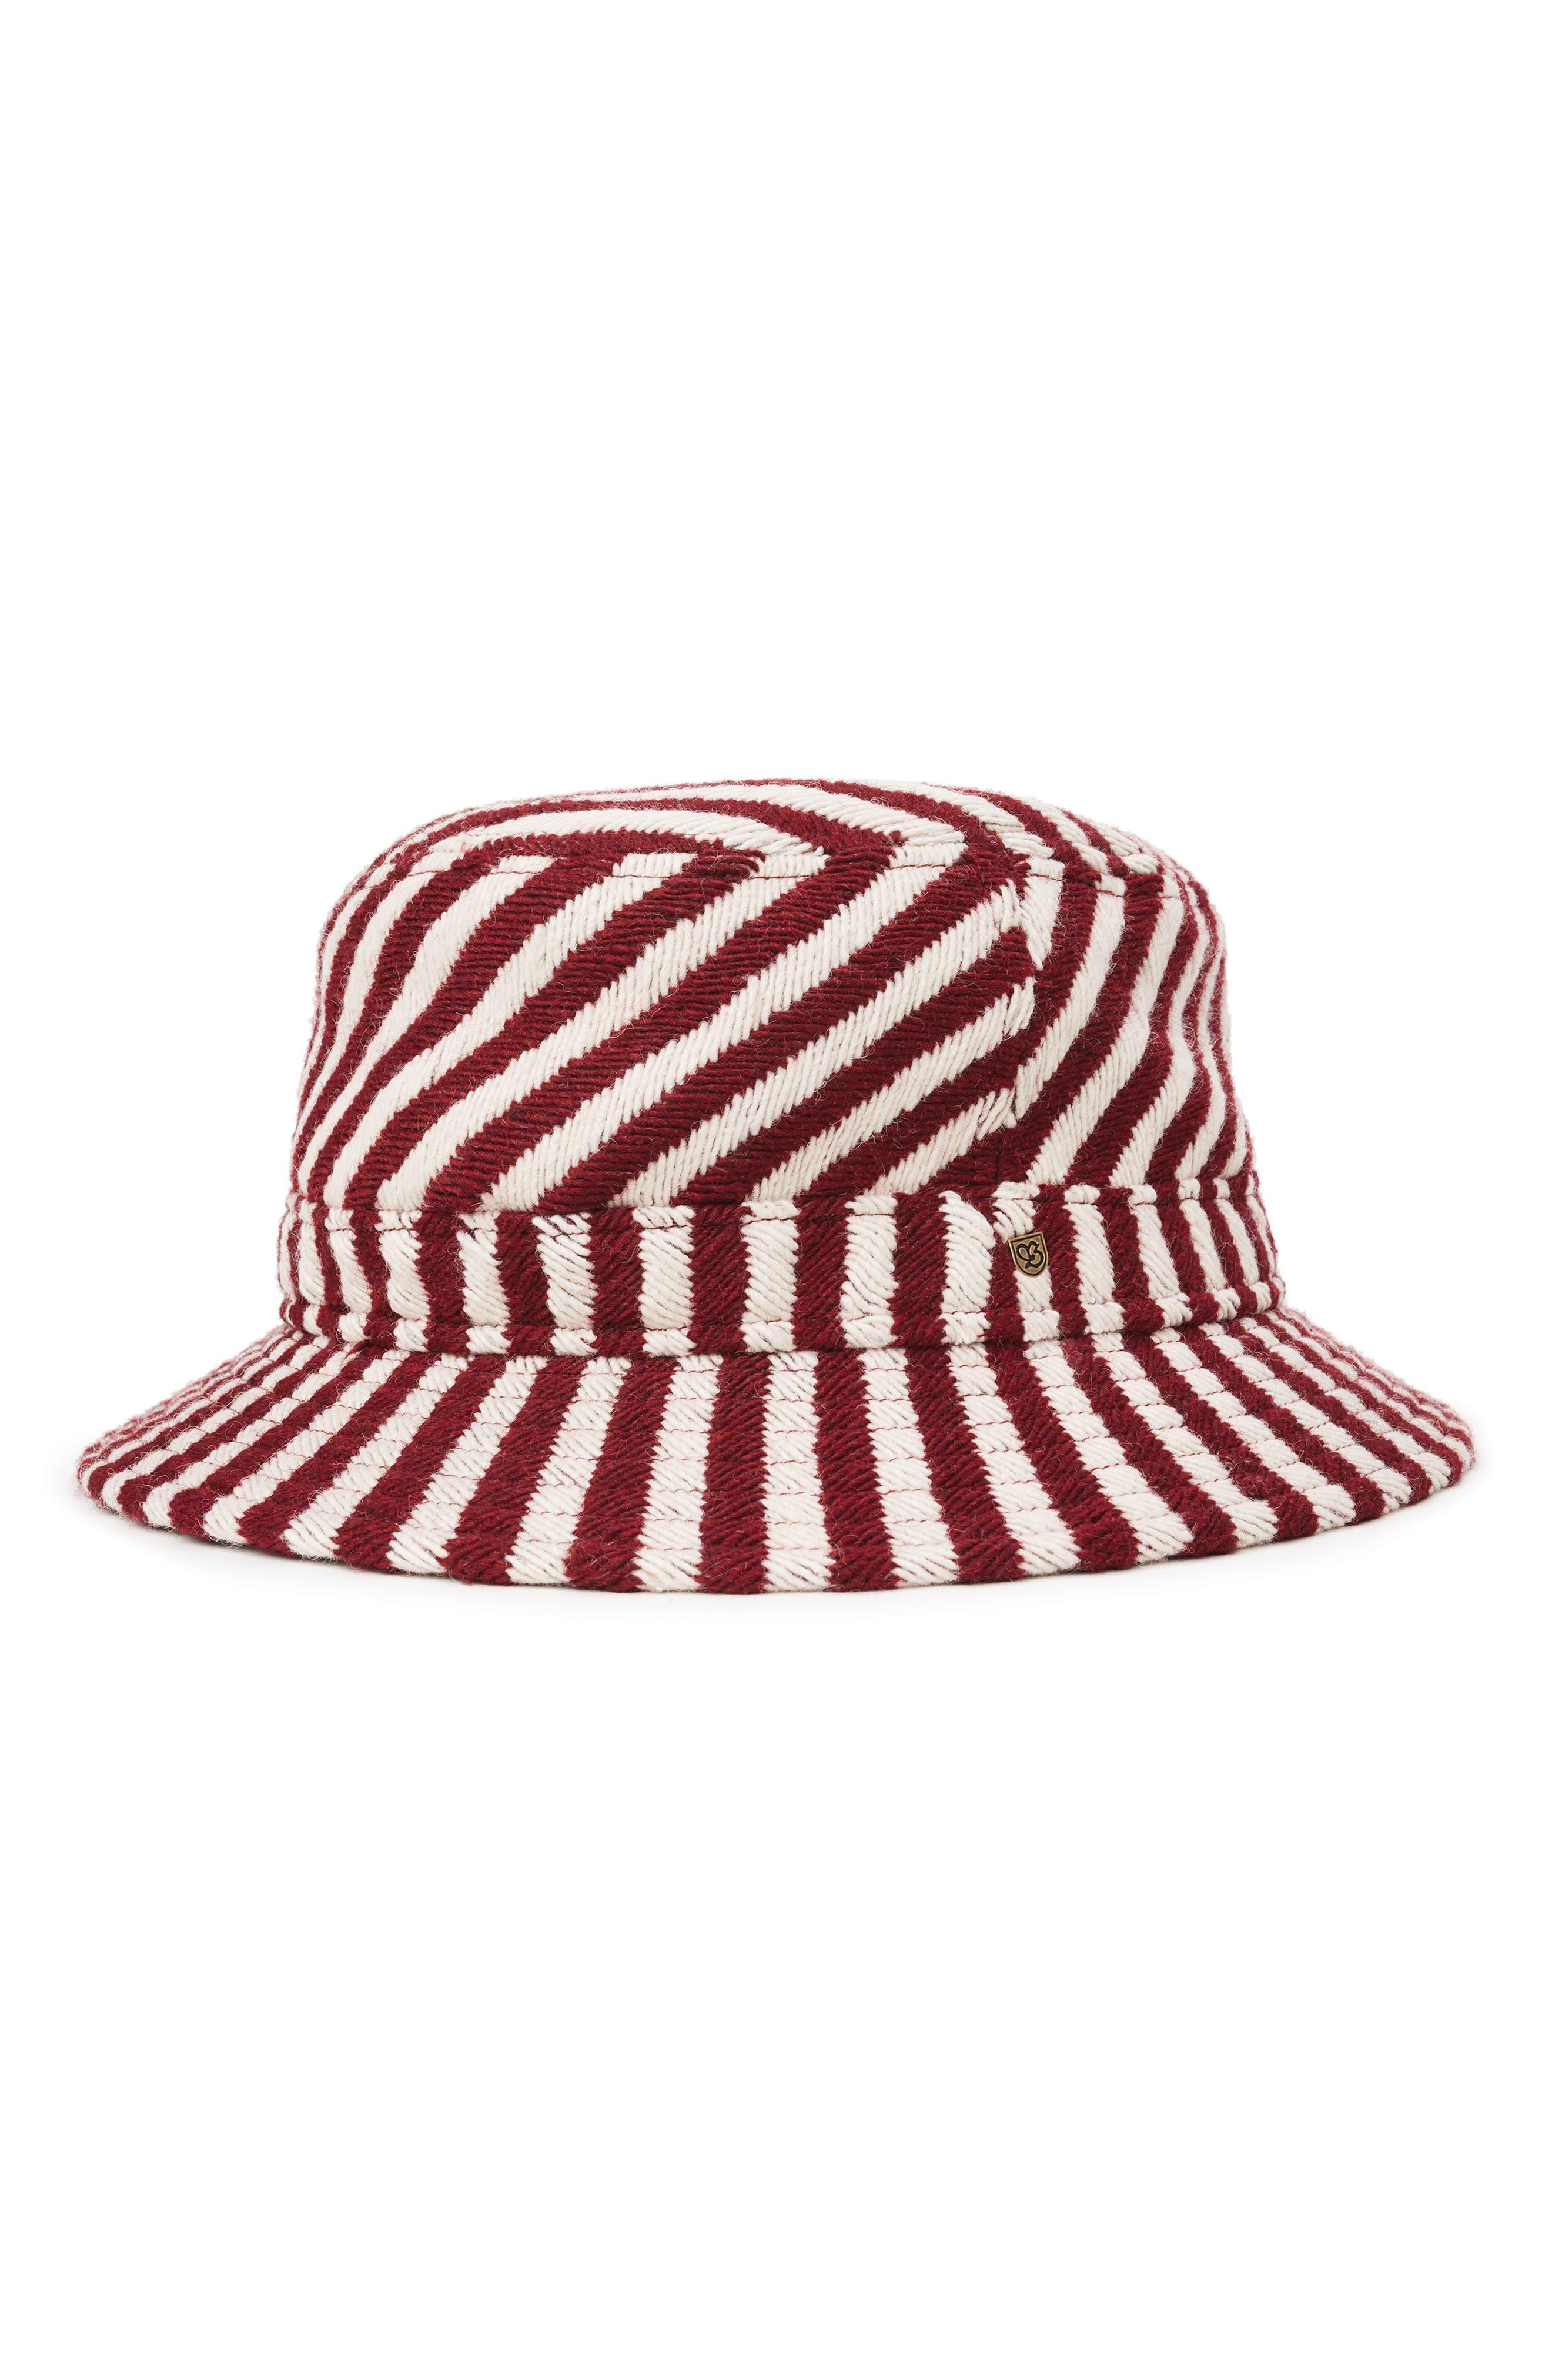 Hardy Bucket Hat - Red in Burgundy/ Cream